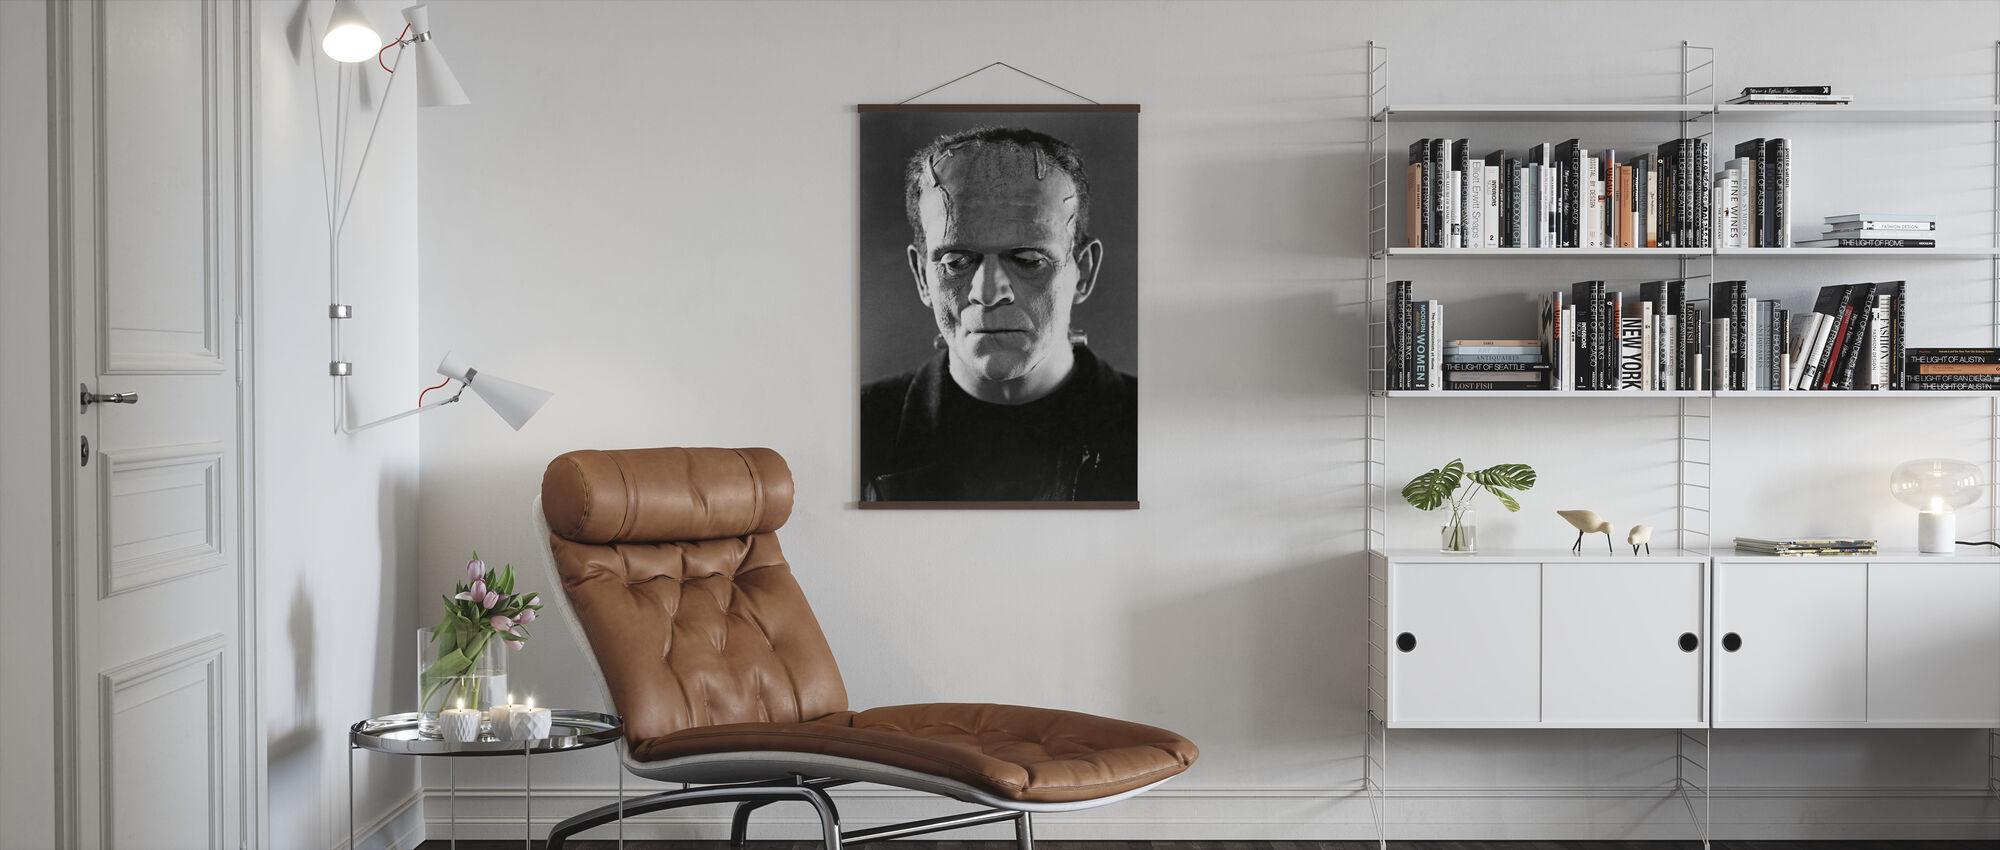 Boris Karloff in the Bride of Frankenstein - Poster - Living Room